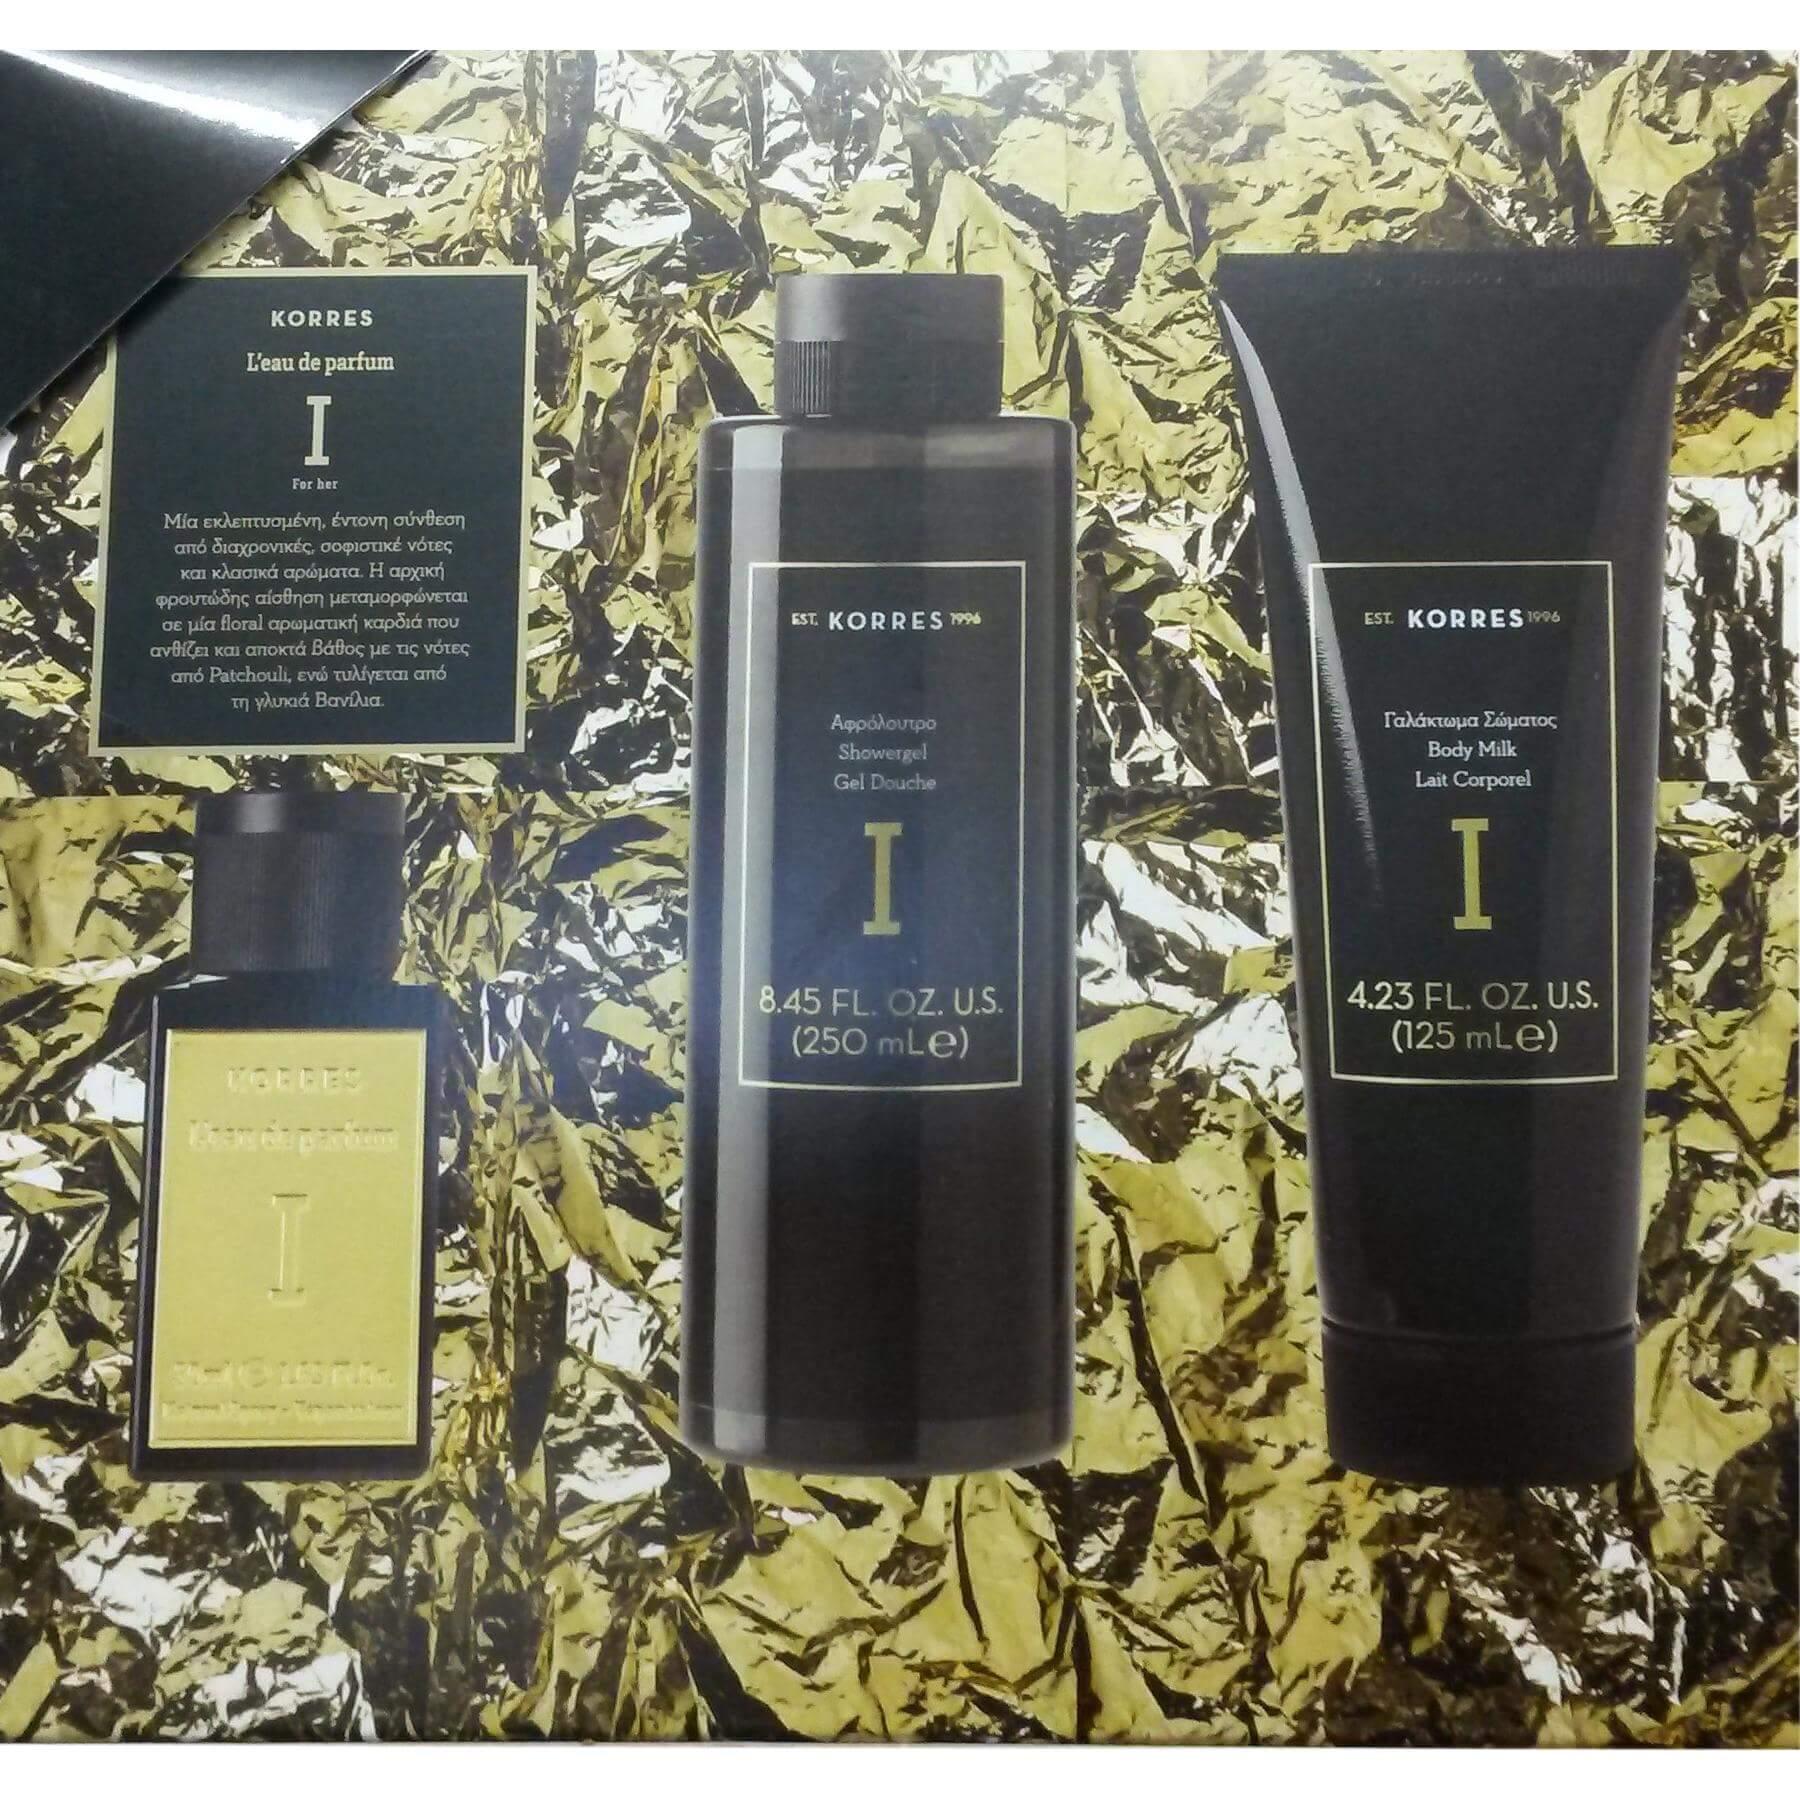 Korres Πακέτο Προσφοράς Γυναικείο Σετ Premium Eau De Parfum I 50ml & Αφρόλουτρο 250ml & Γαλάκτωμα Σώματος 125ml